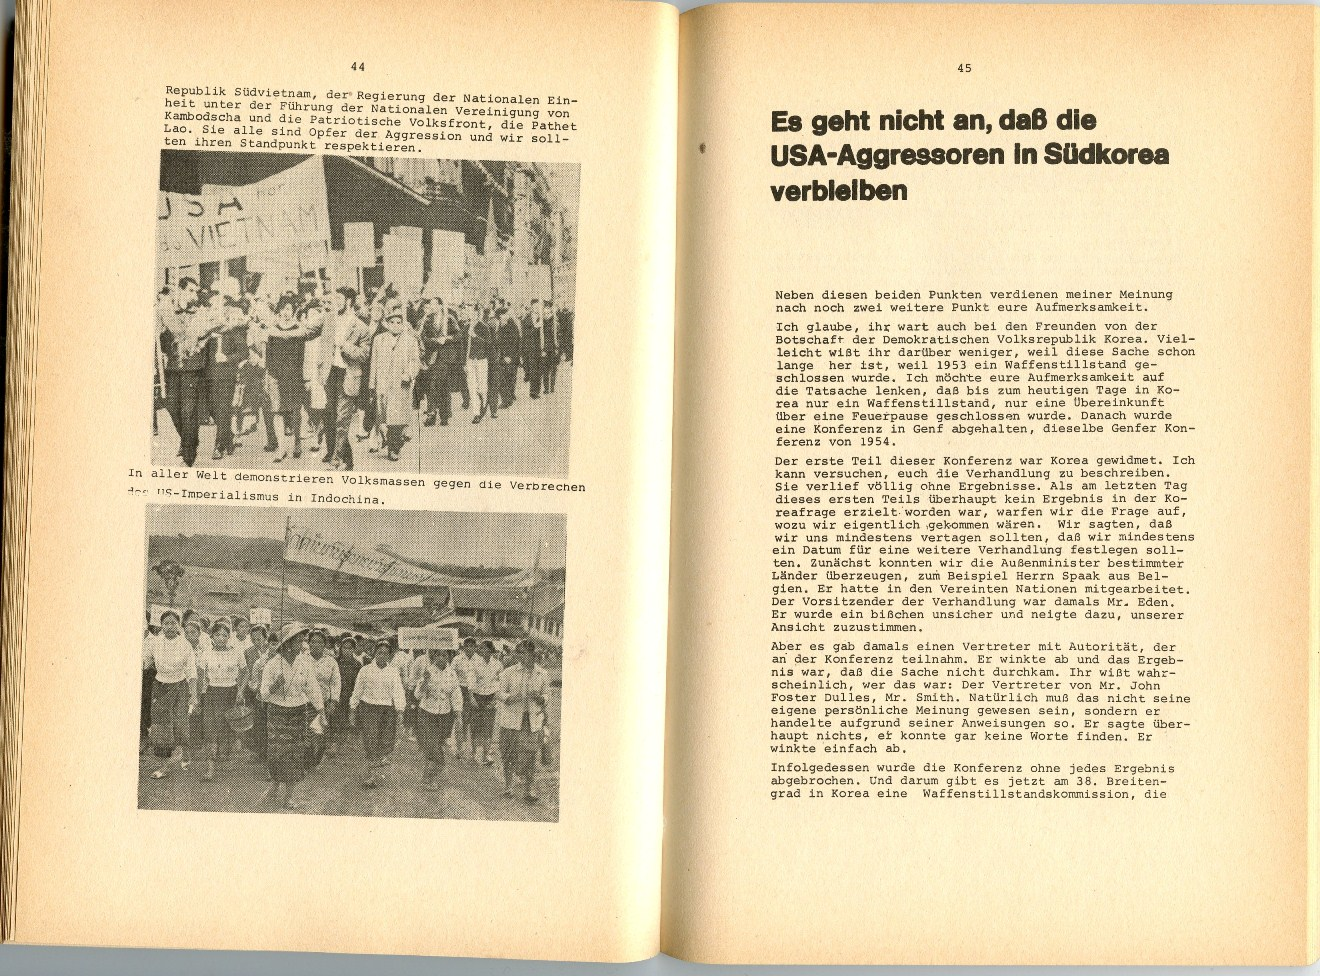 ZB_VRChina_Bollwerk_1971_24